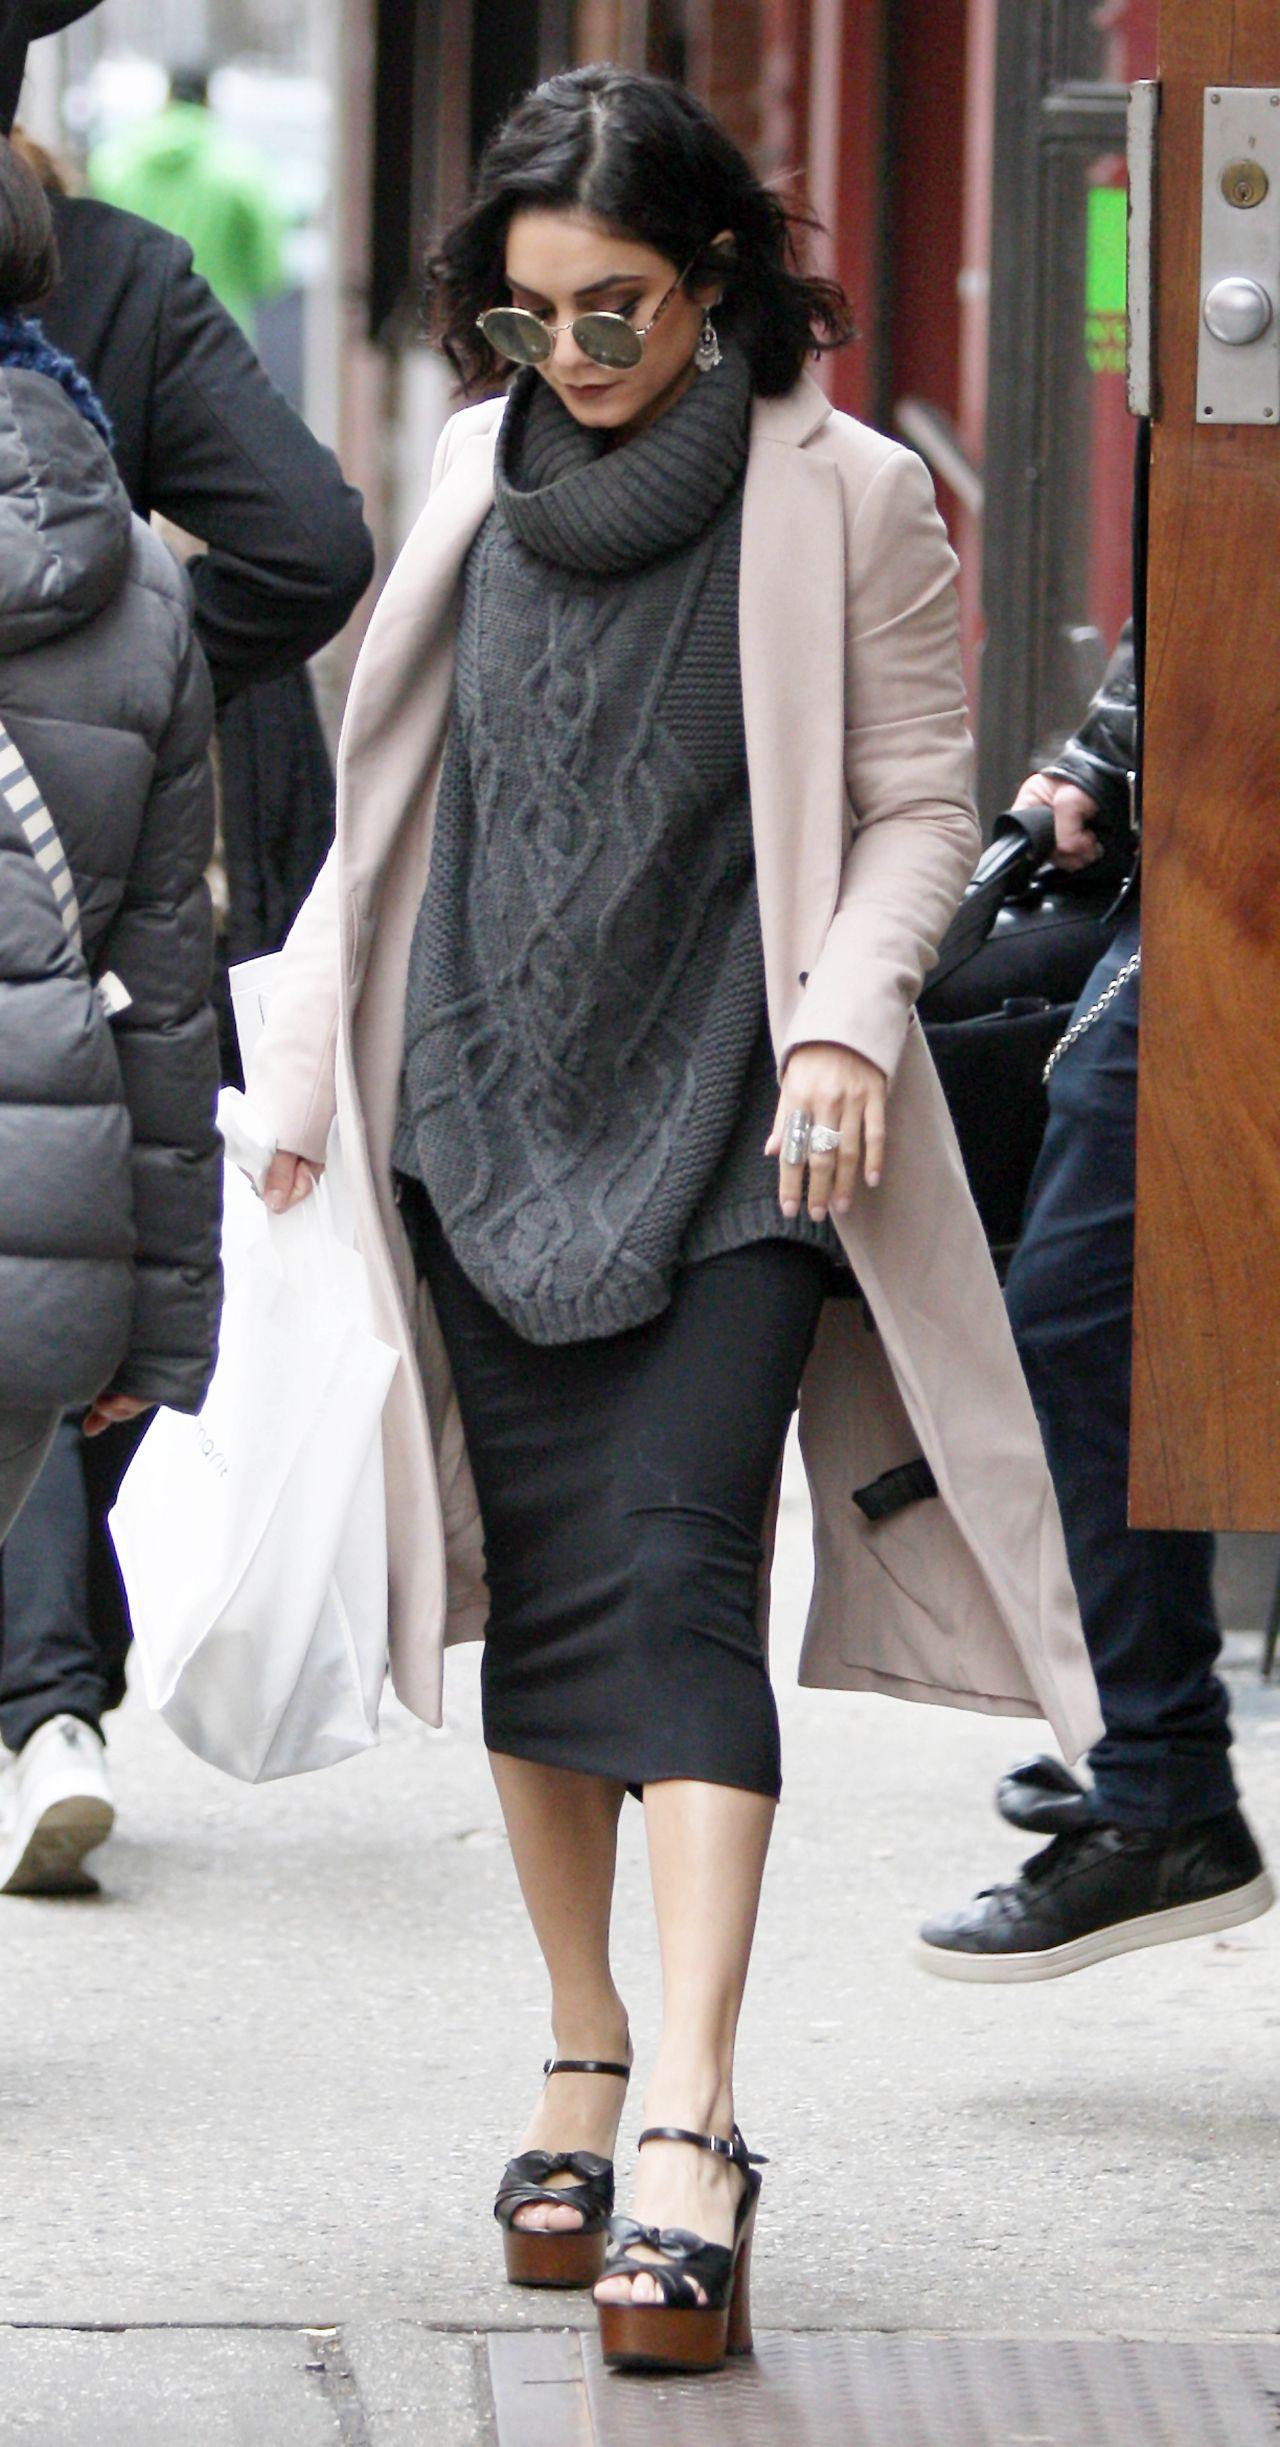 Vanessa Hudgens Style Leaving Her Hotel In New York City April 2015